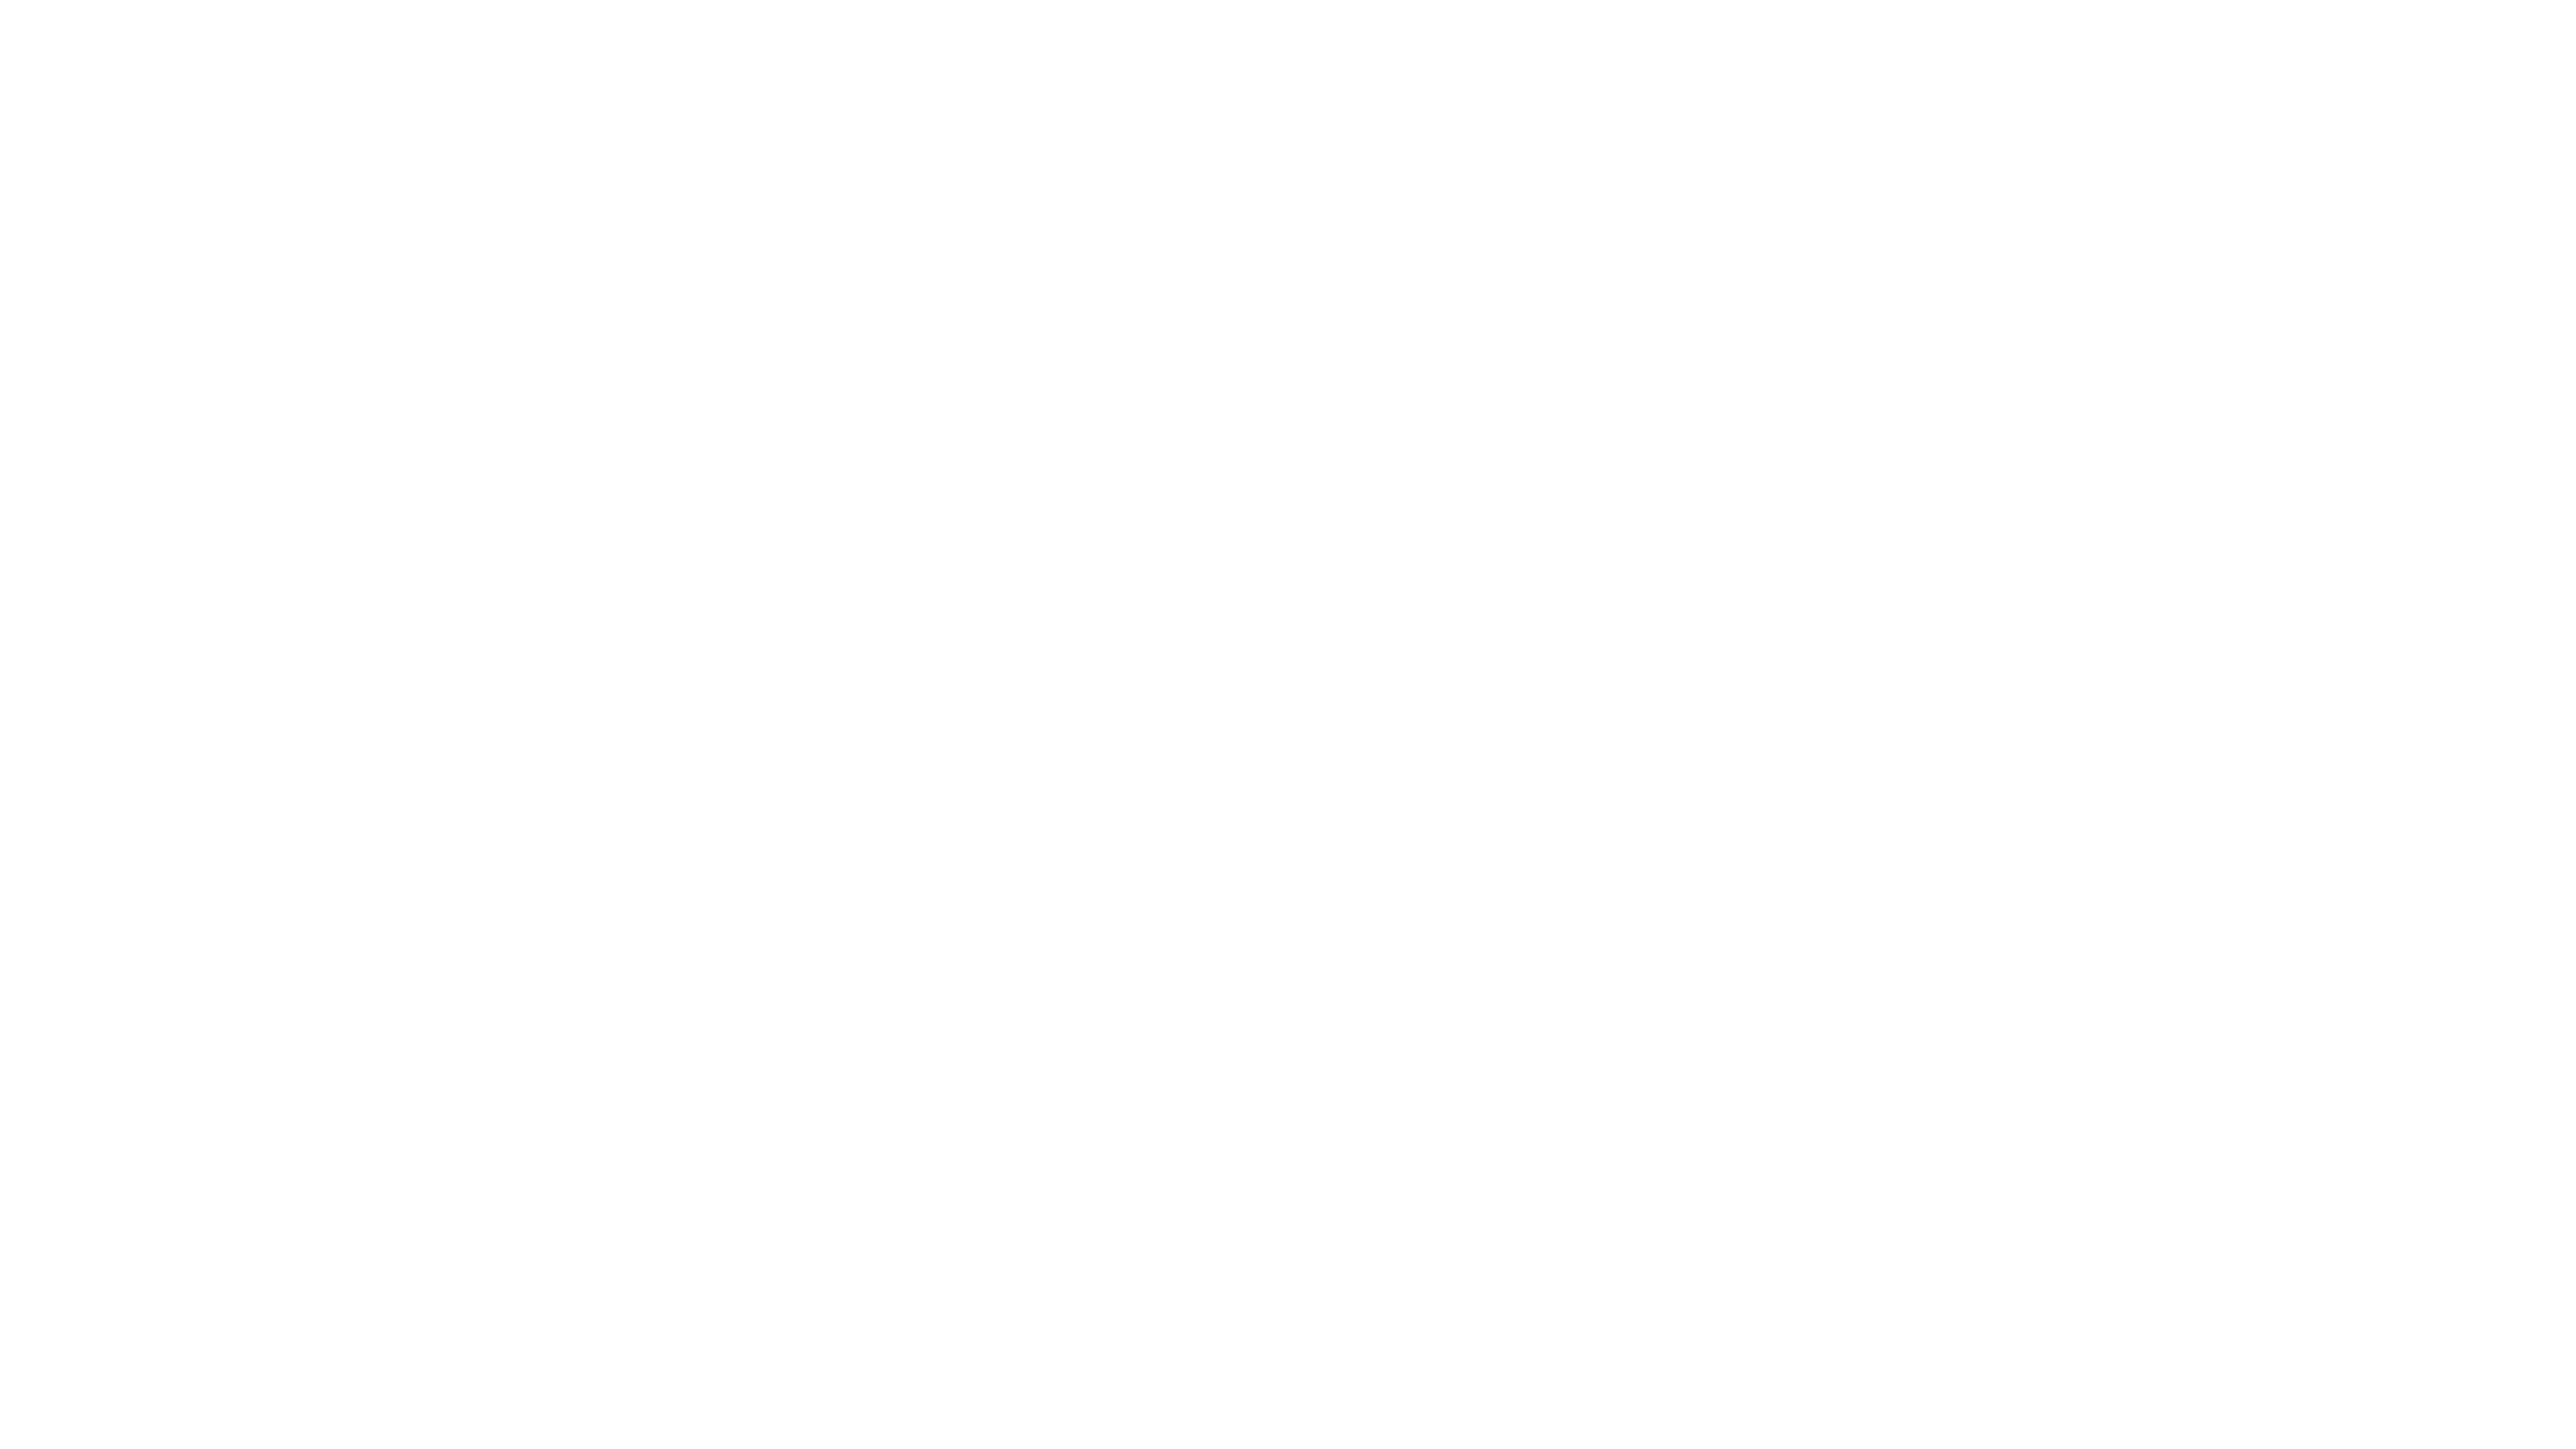 ekis-company-orizzontale-white